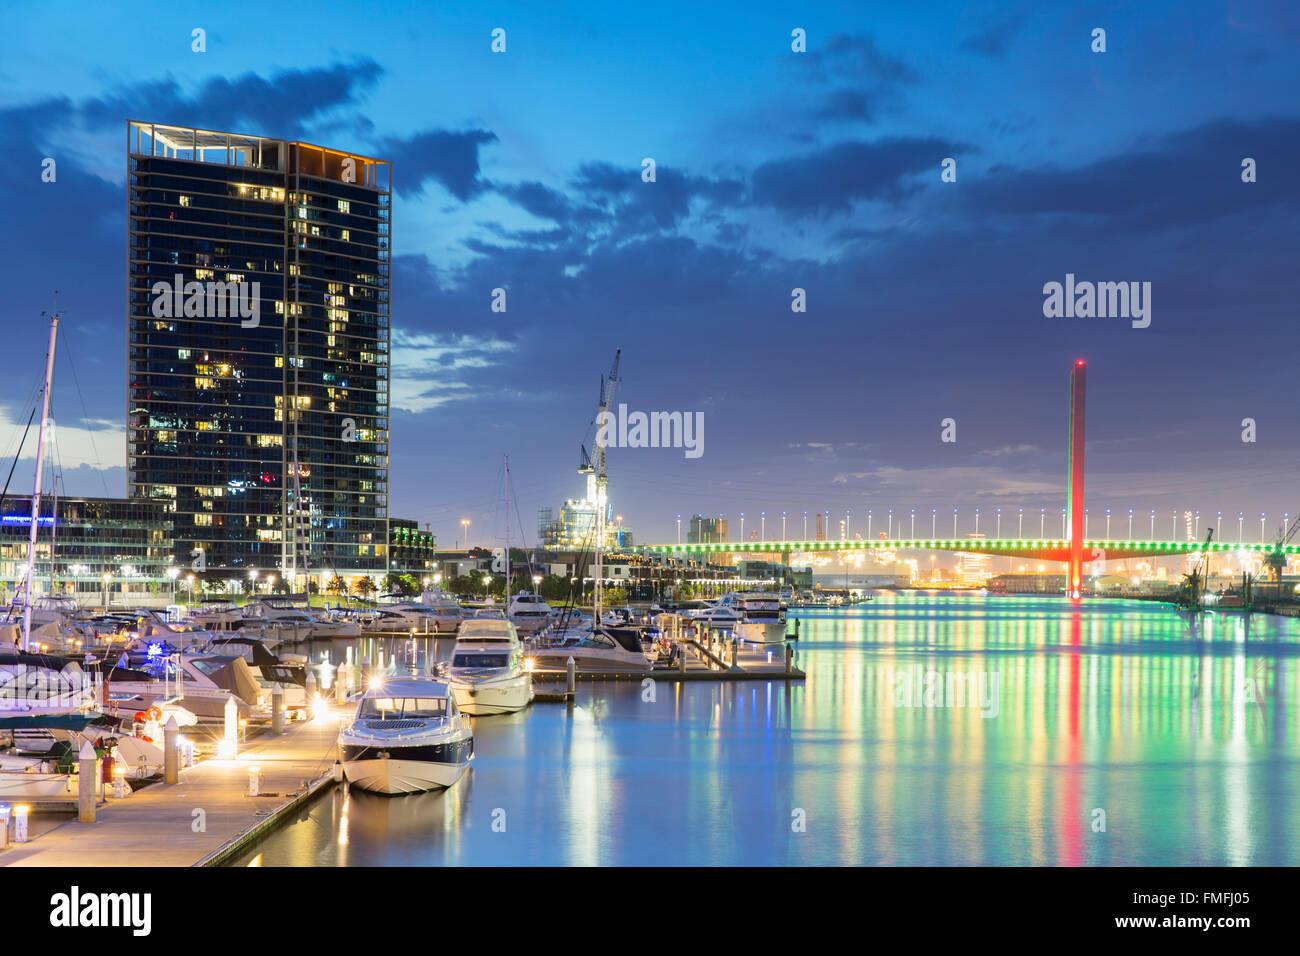 Borde del Yarra Harbour al anochecer, Melbourne, Victoria, Australia Imagen De Stock